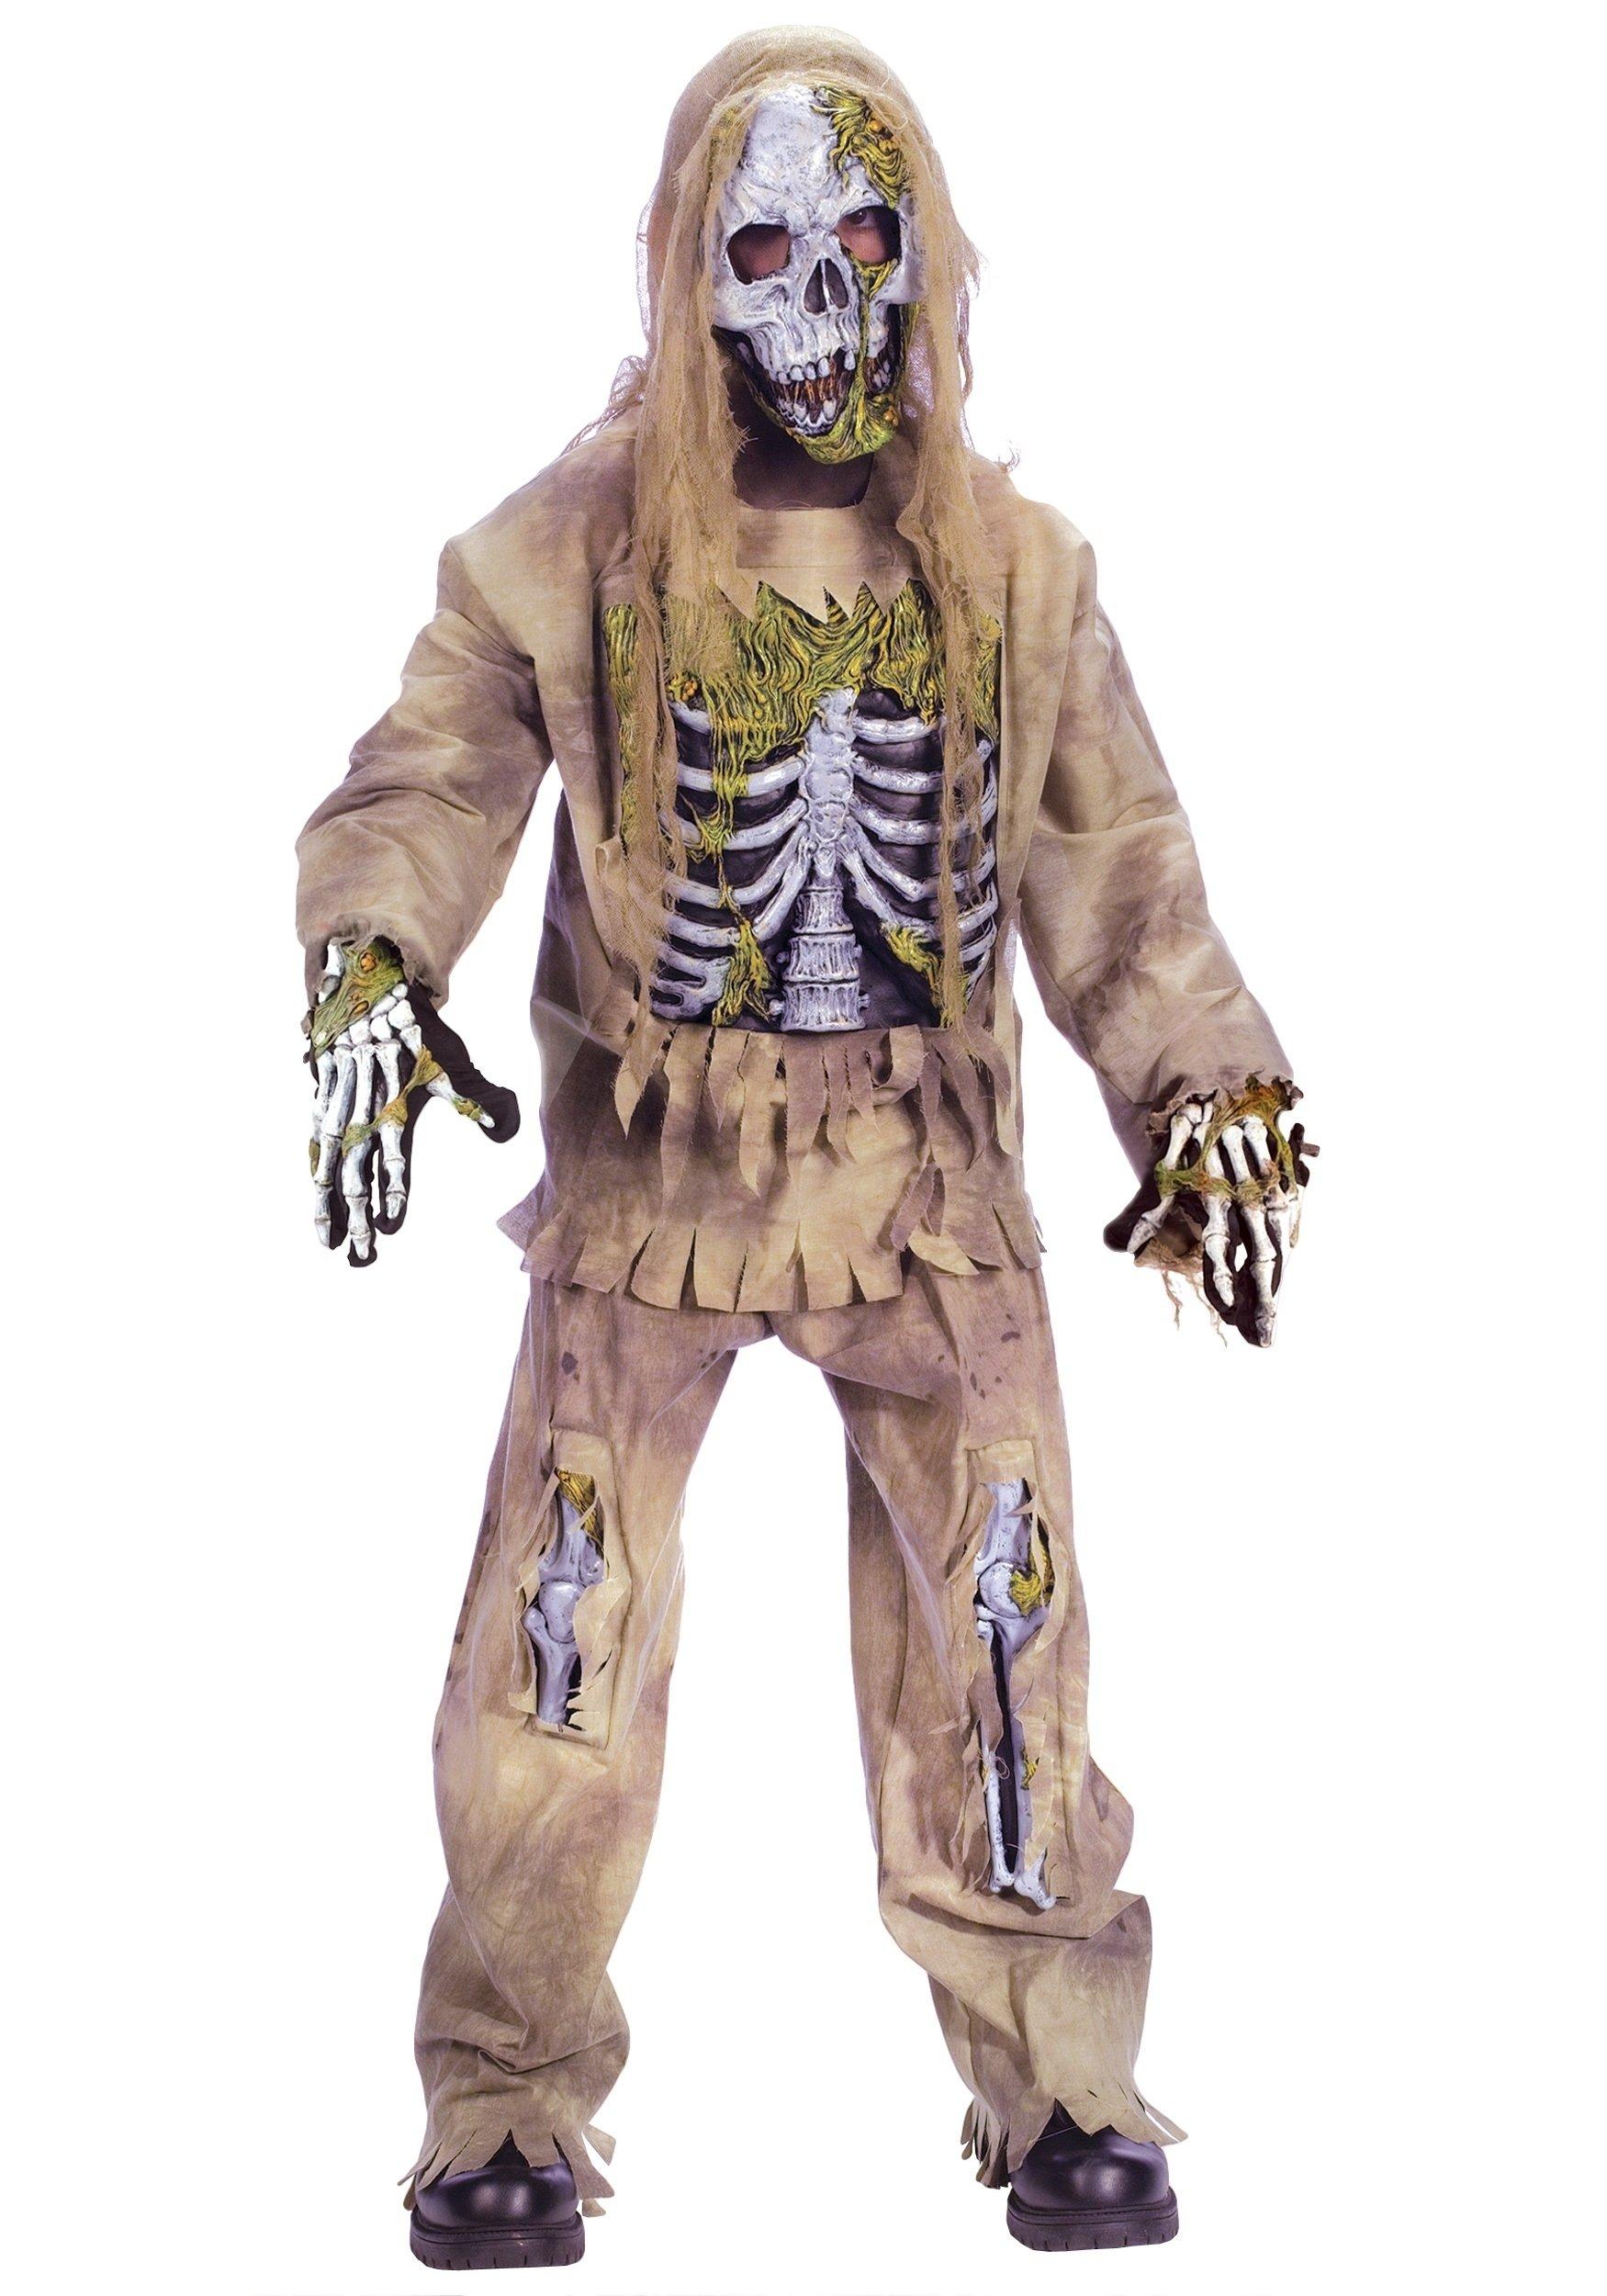 10 Attractive Zombie Costume Ideas For Kids kids skeleton zombie costume 2021